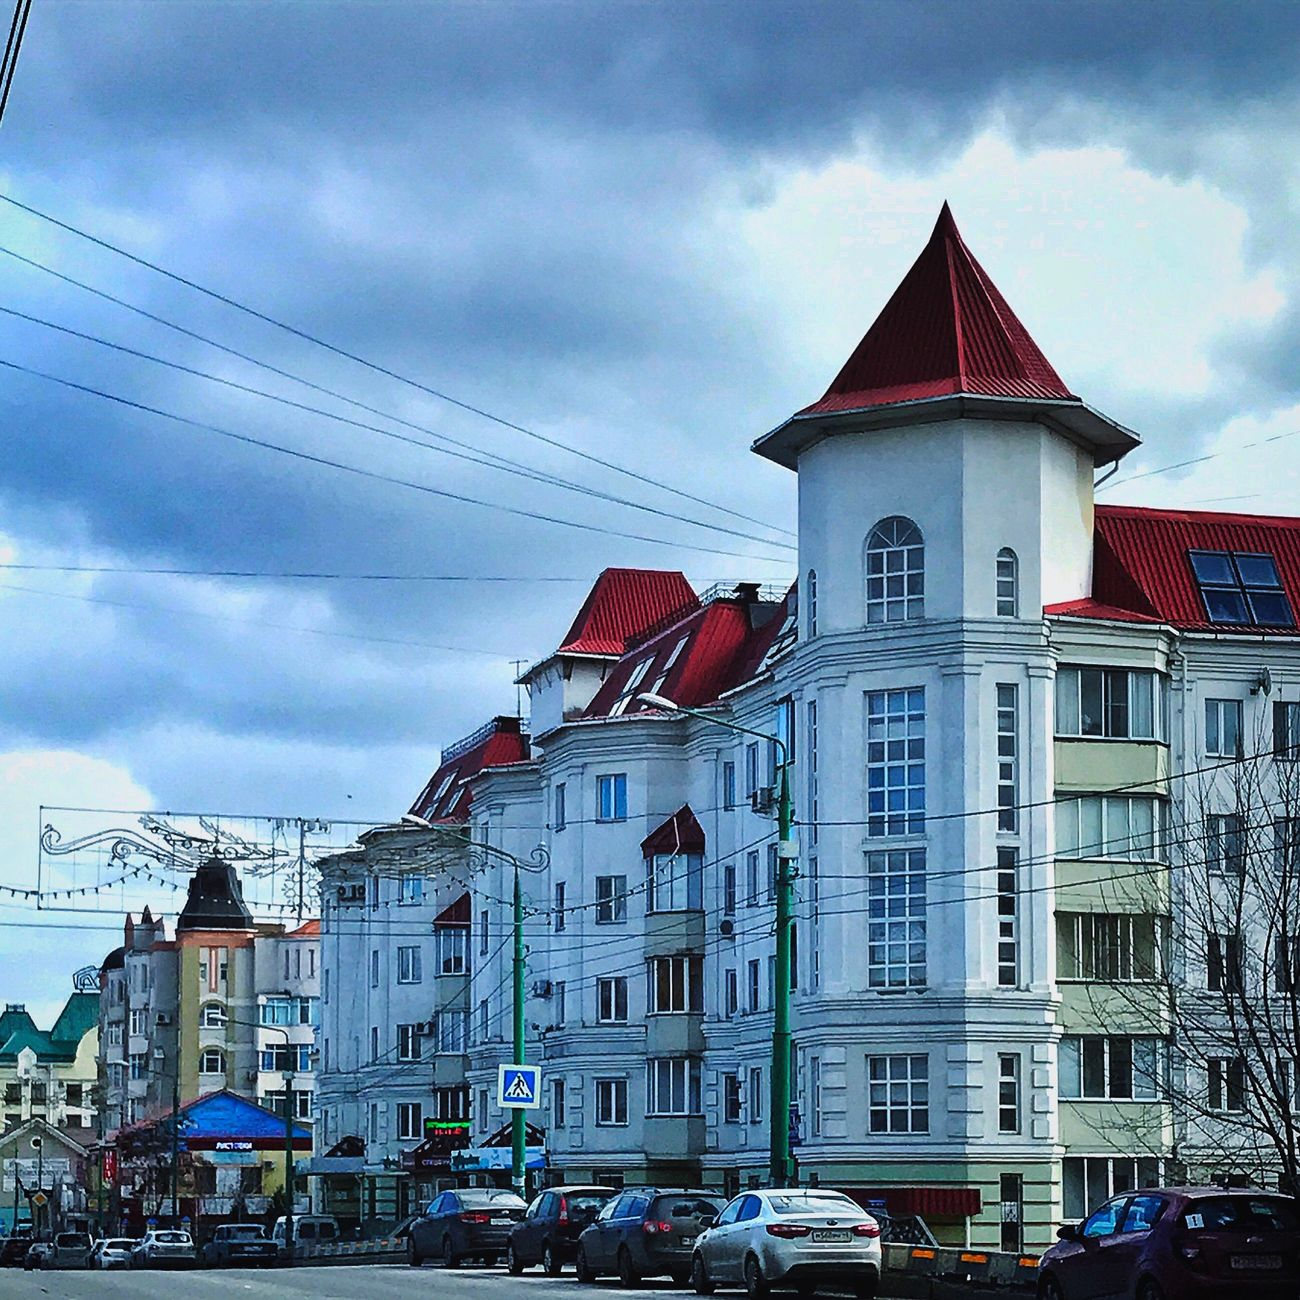 Cloud - Sky Building Exterior Sky Architecture Built Structure Outdoors Day City No People Lipetsk липецк